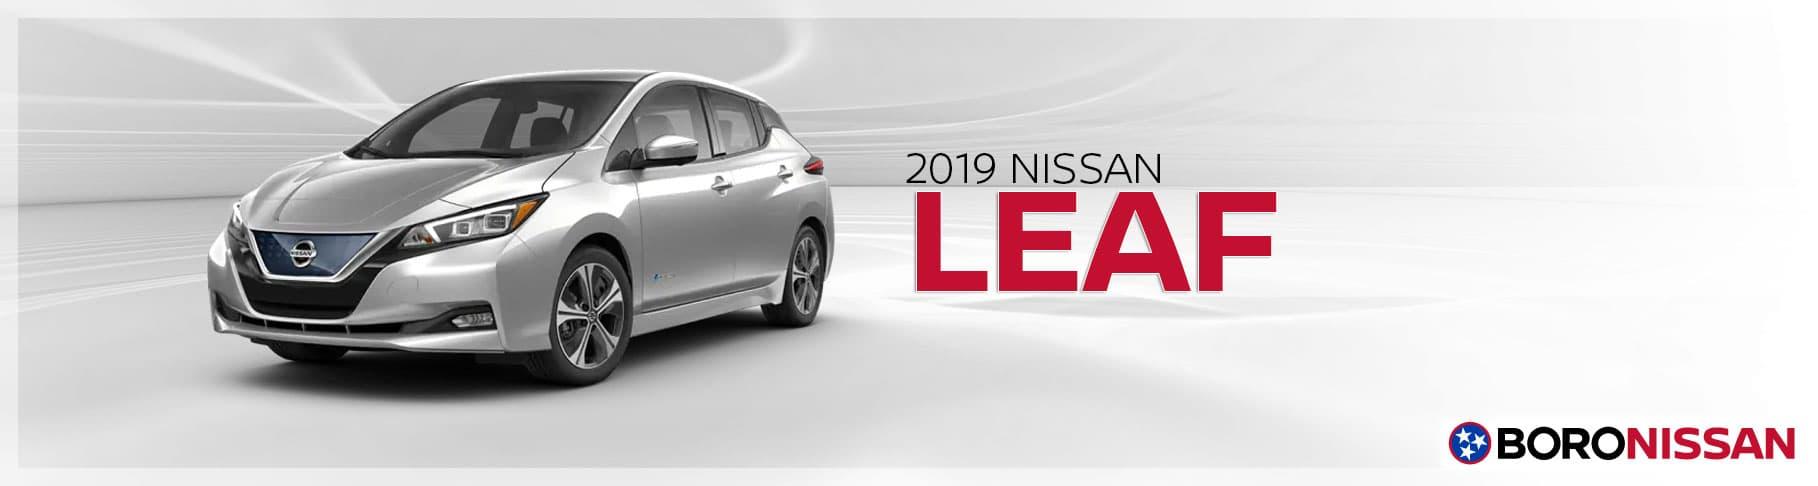 2019 LEAF near Nashville, Tennessee   Murfreesboro Nissan